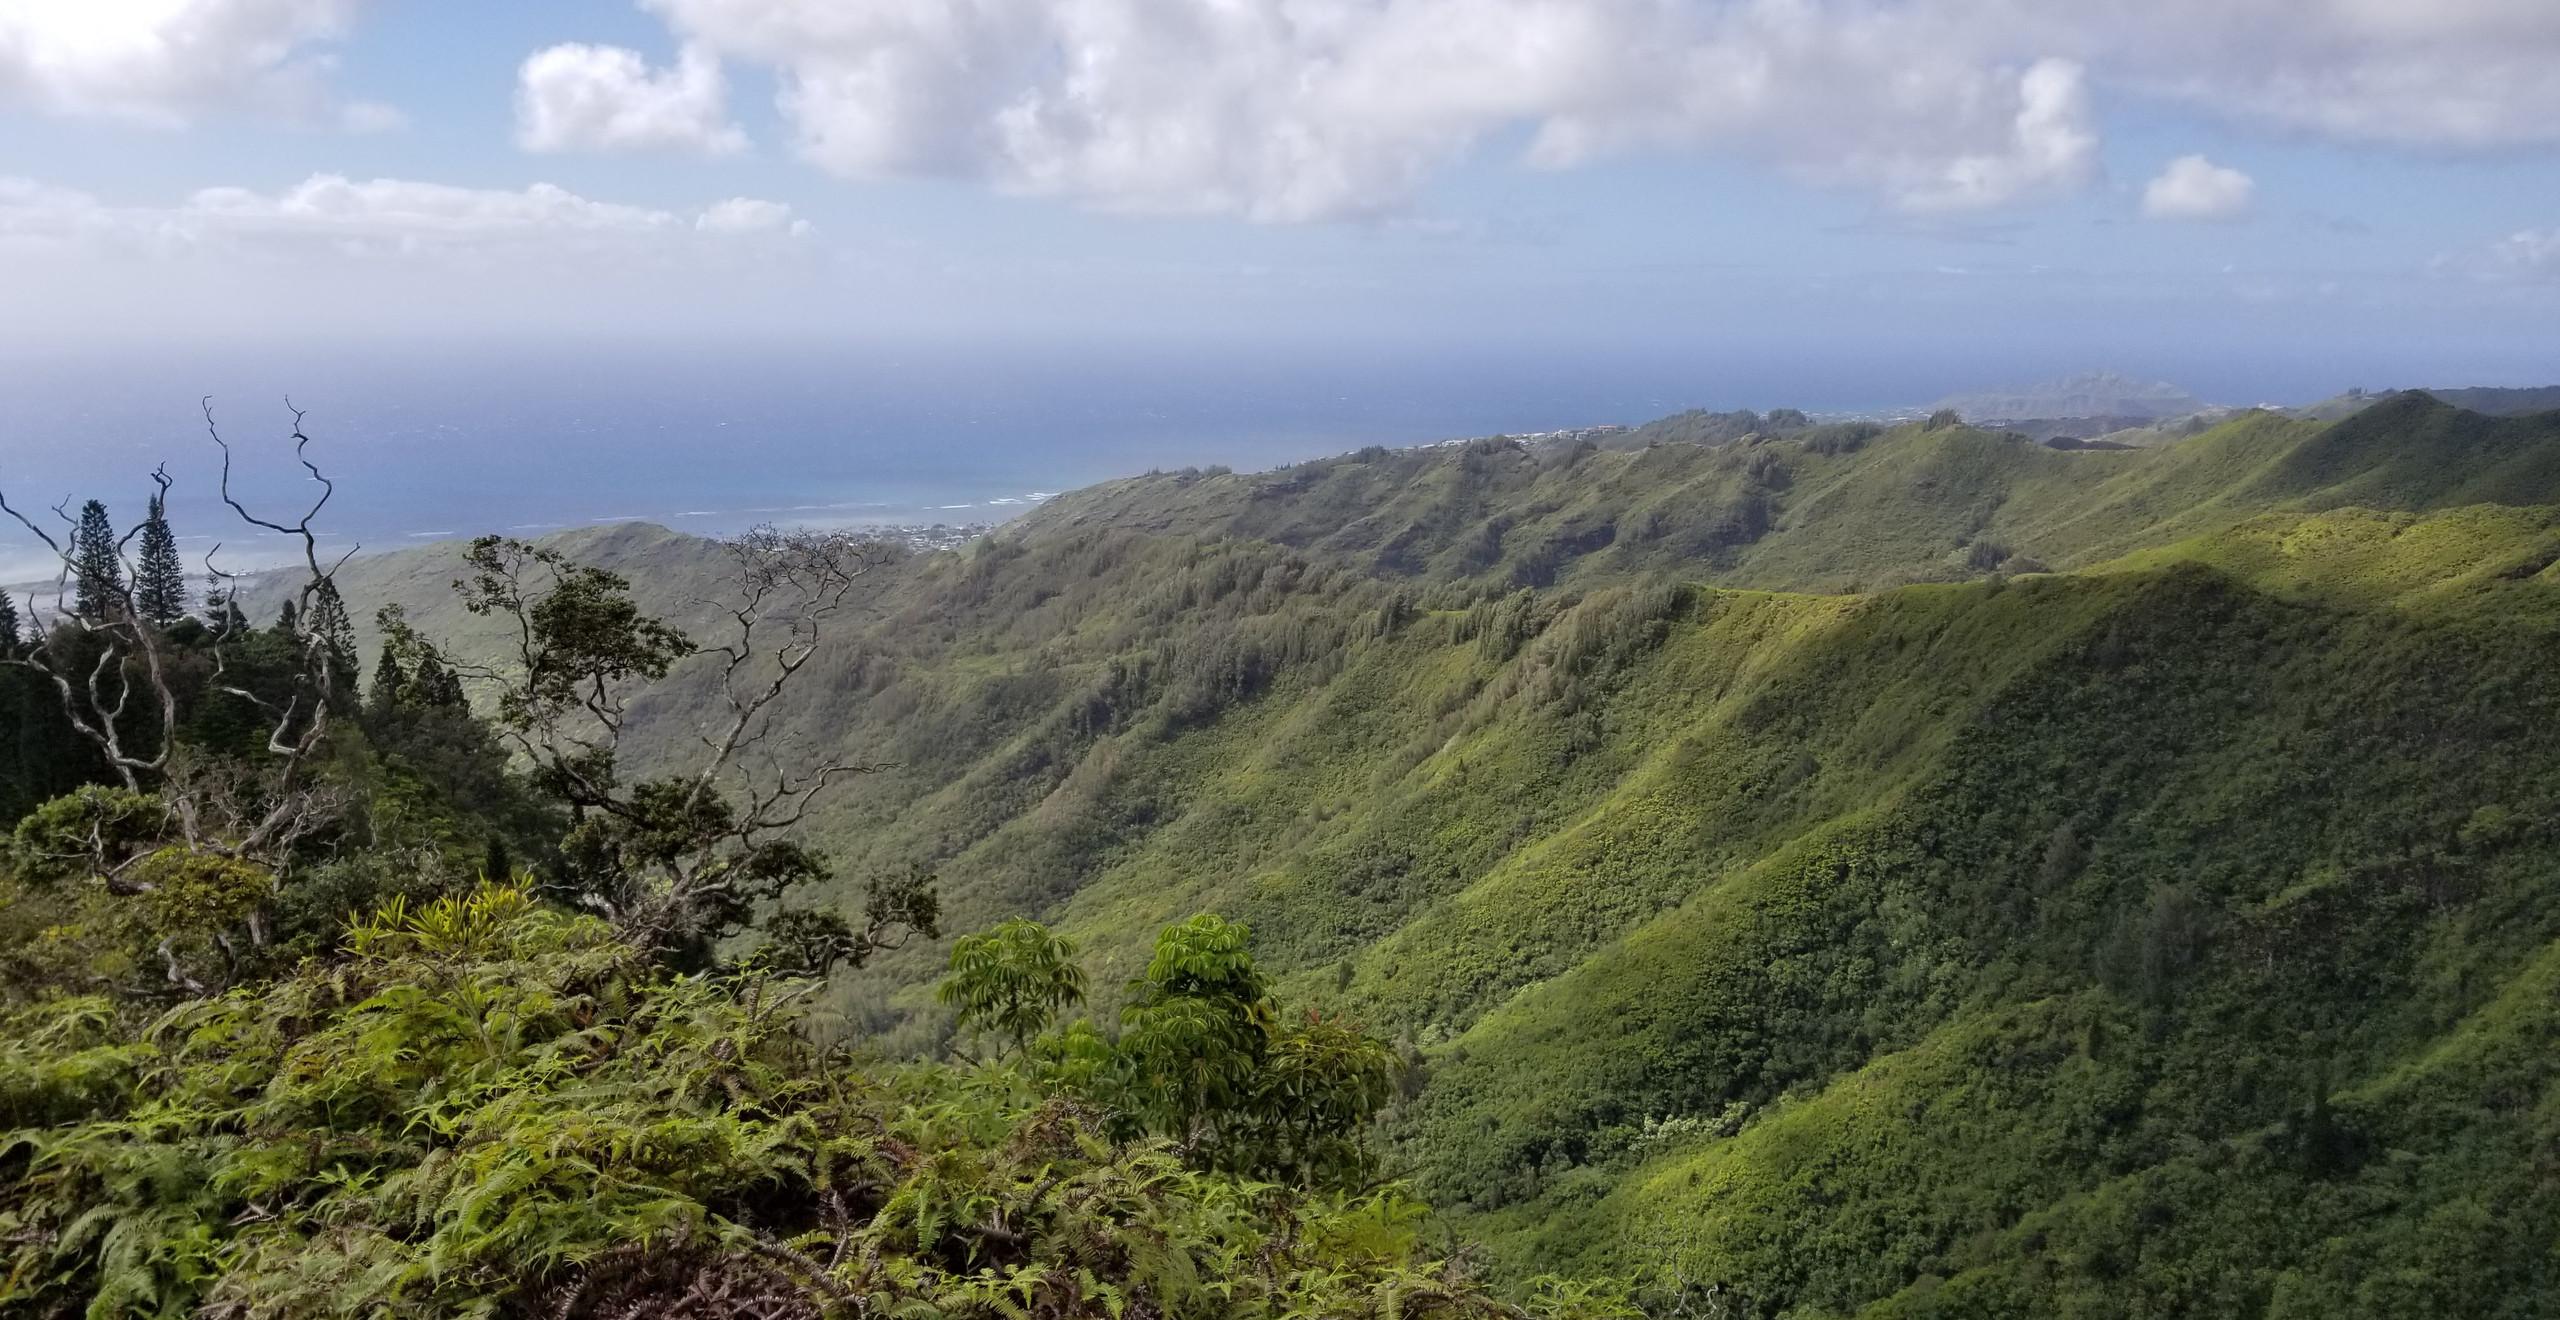 Kuli'ou'ou Ridge Trail, Hawaii Hiking, hawaii ridges, mountain hawaii, oahu hikes, oahu, hiking, tropical hiking, tropical islands